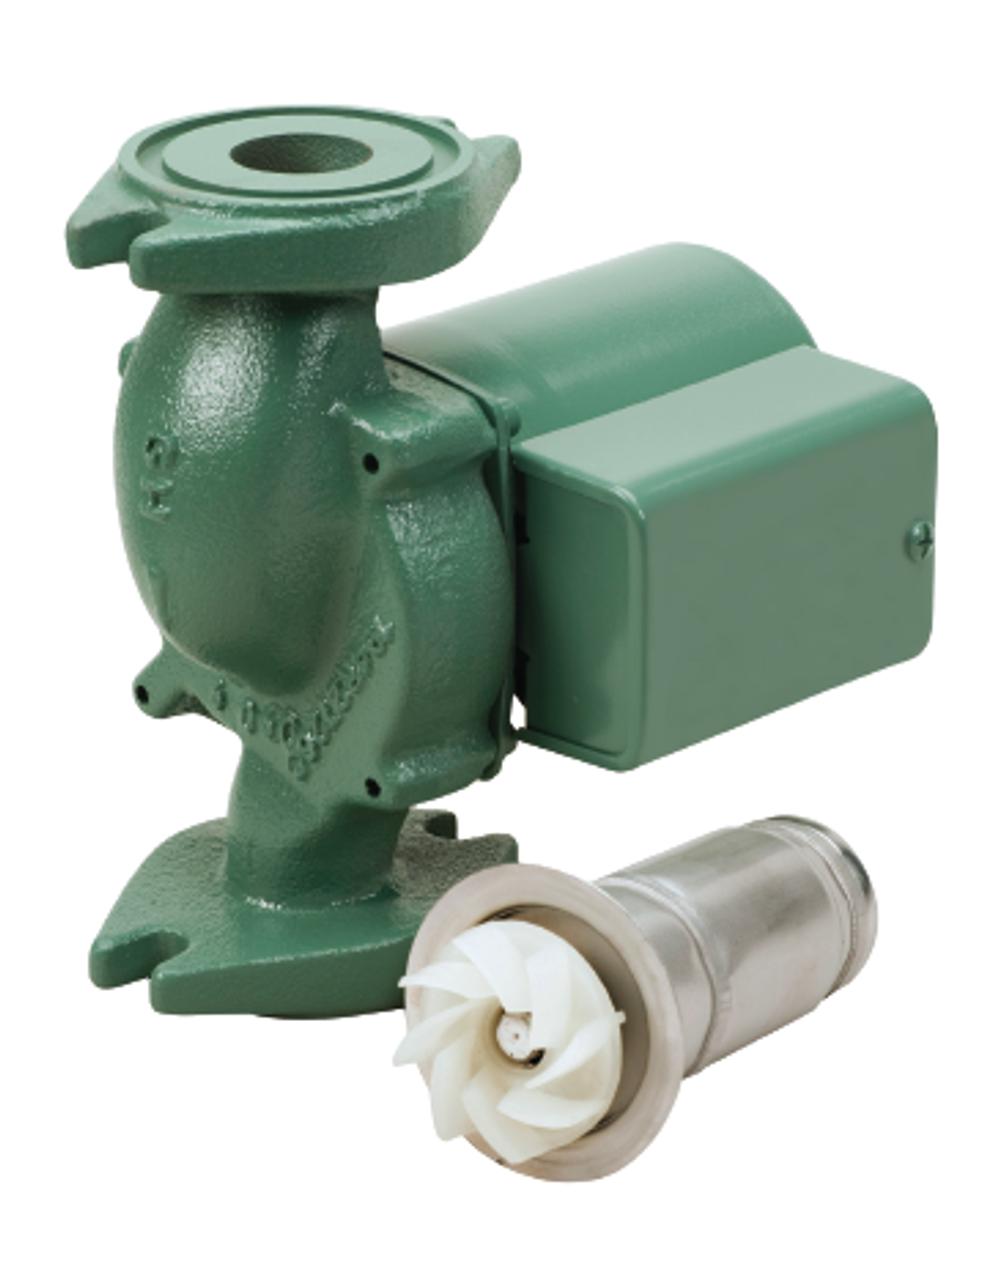 007F55    Taco    Cast Iron    Circulator    With 125 HP   National Pump Supply